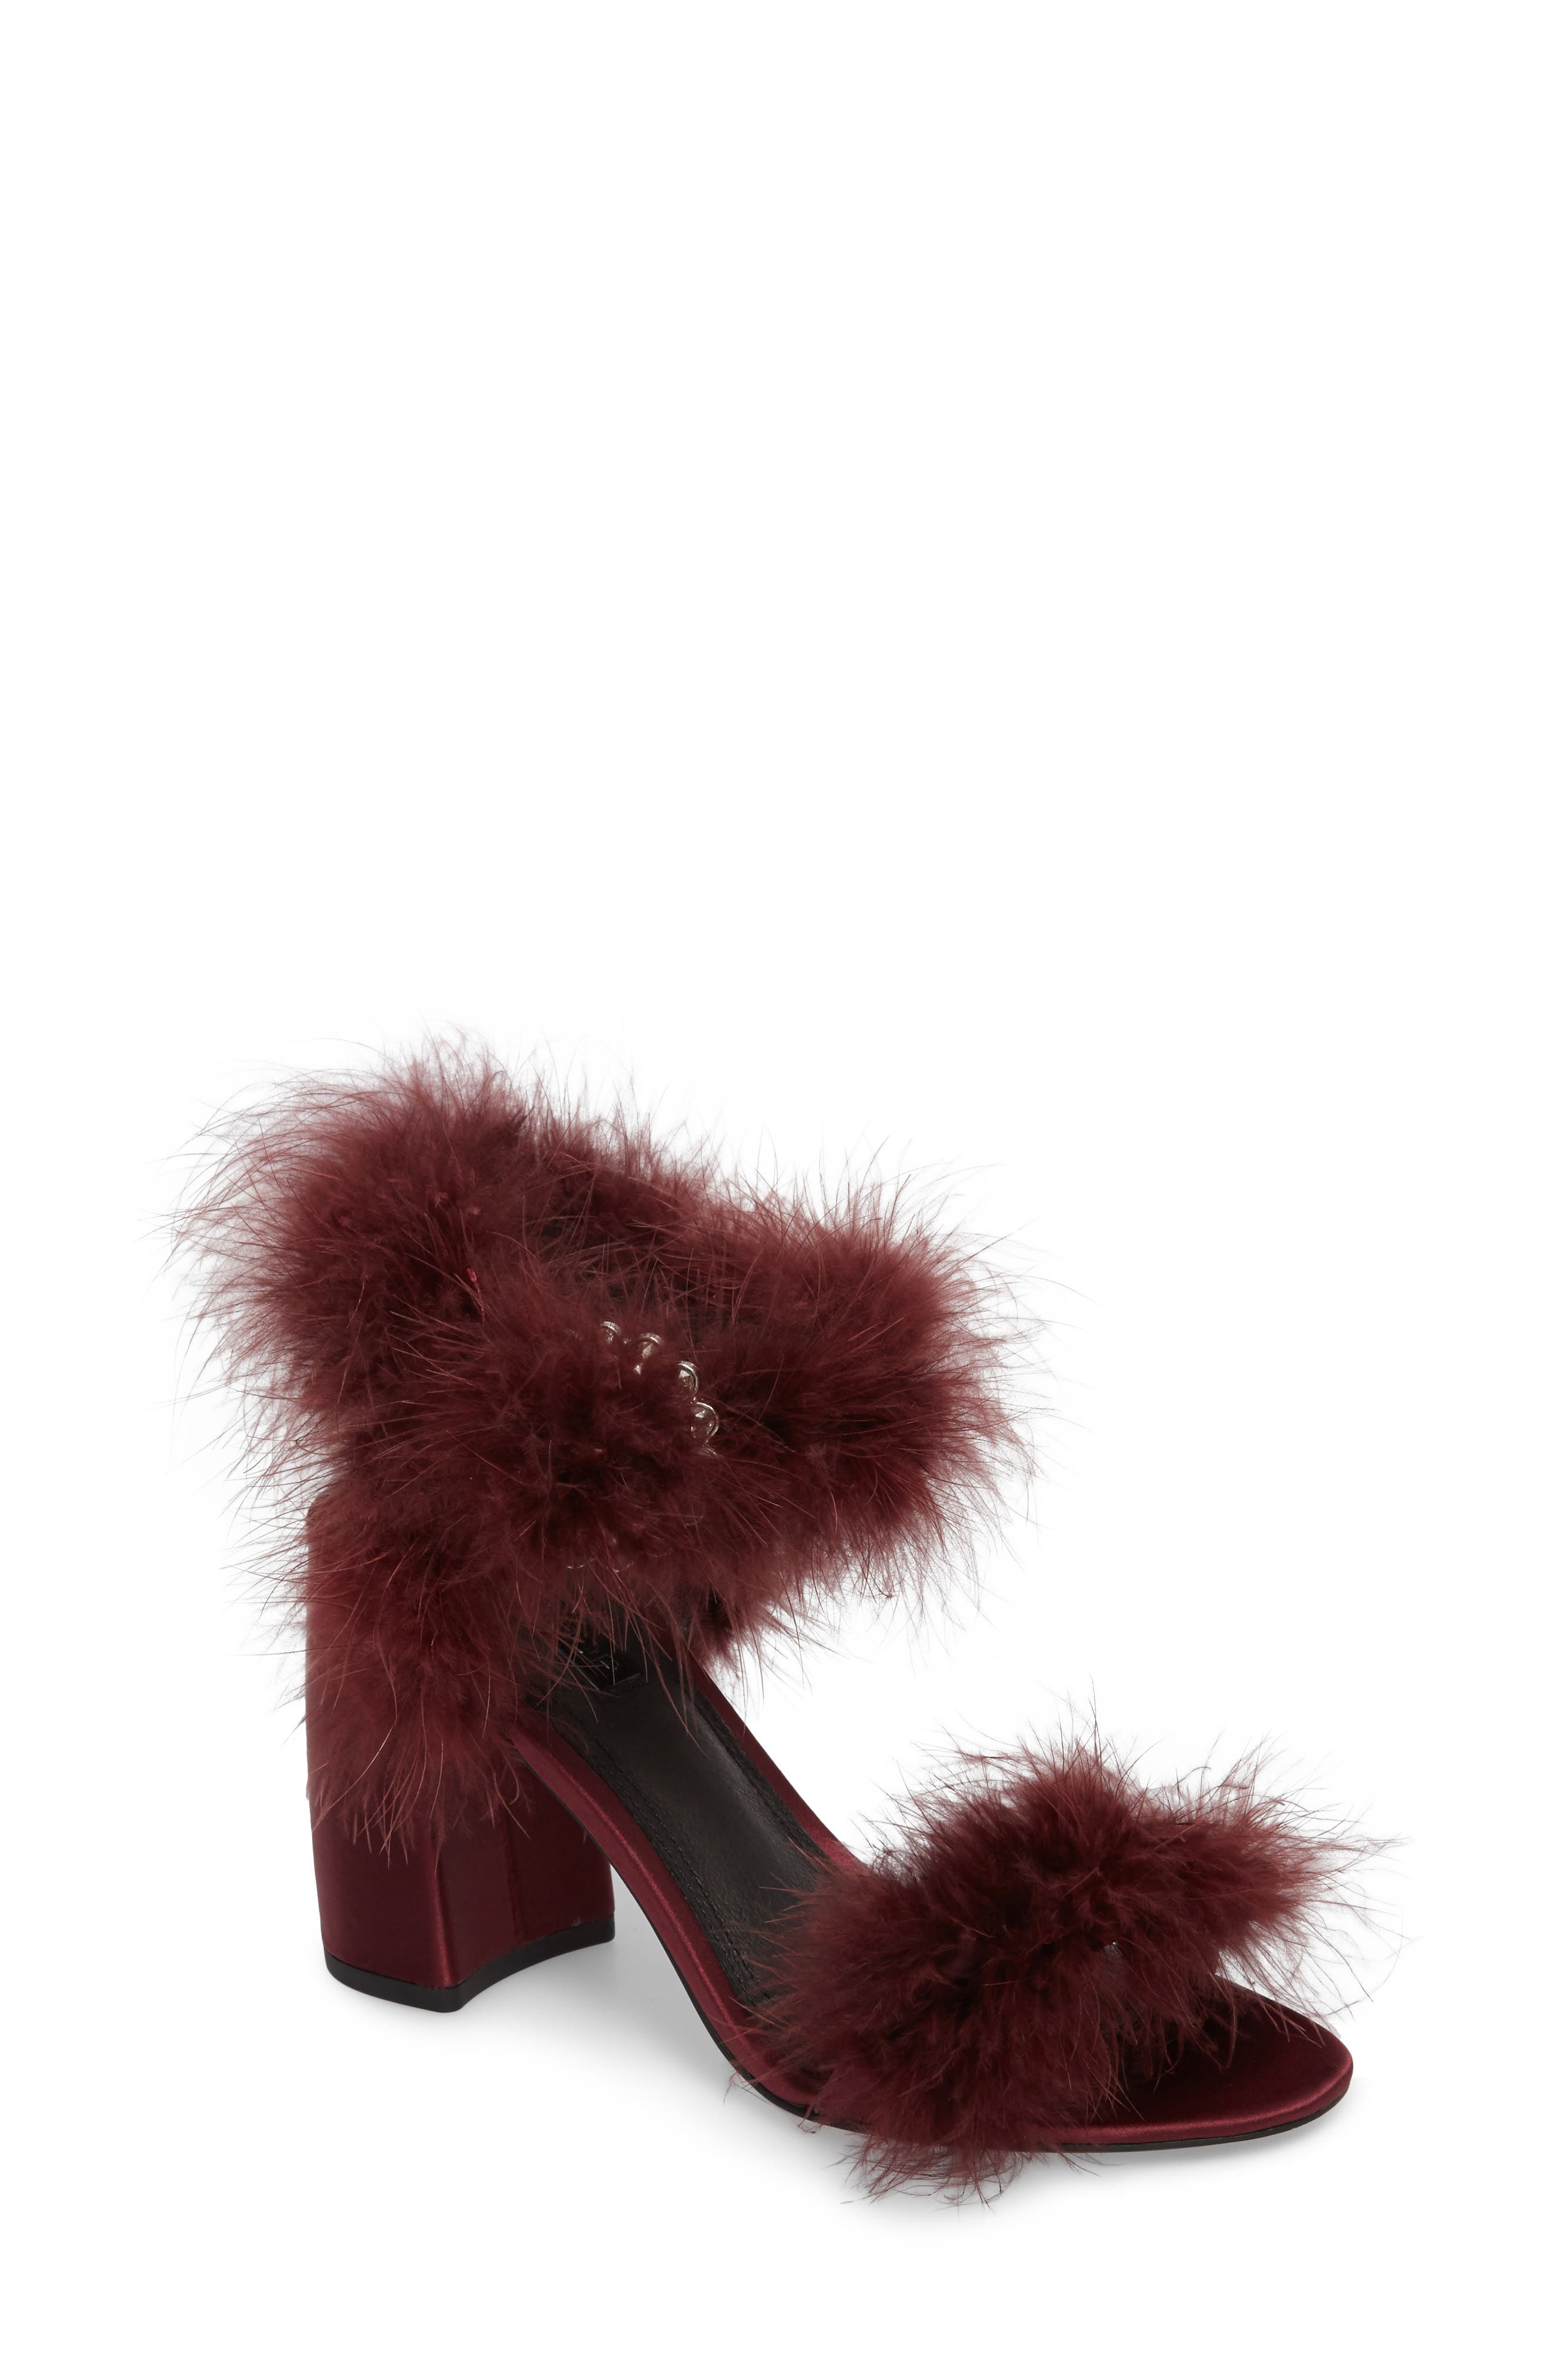 Main Image - Topshop Maribou Feather Sandal (Women)